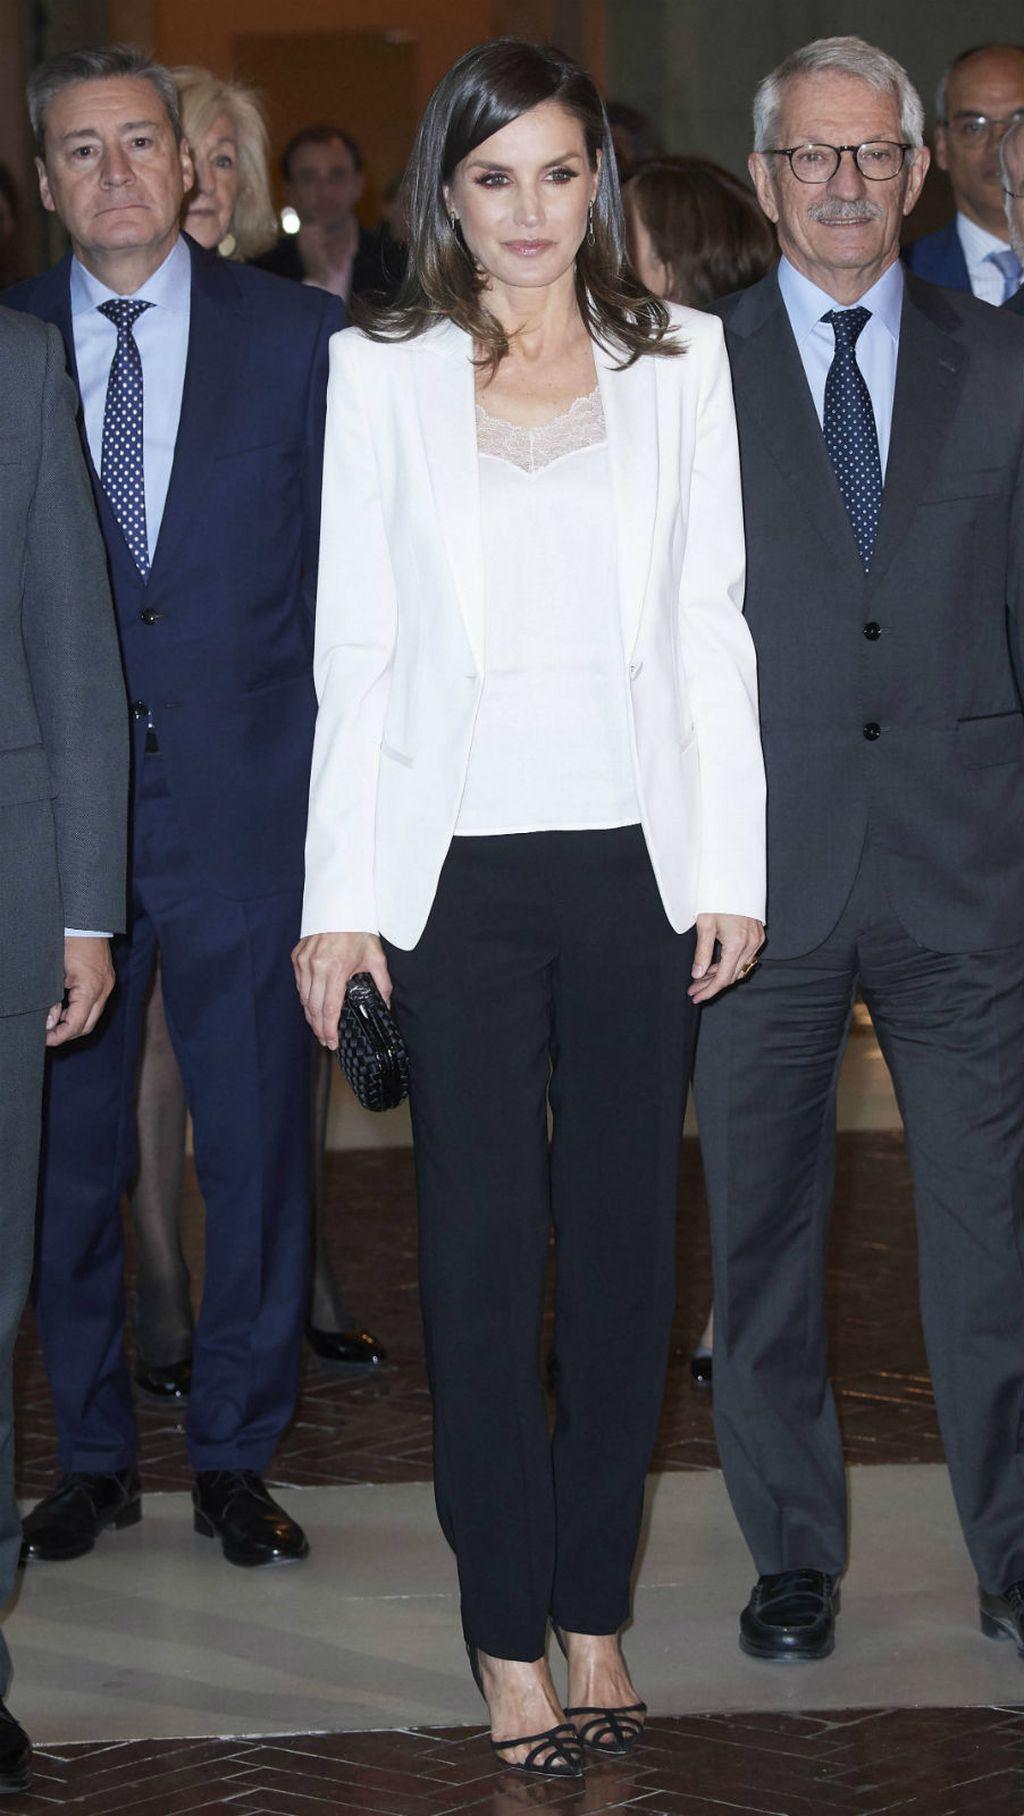 Kraljica Letizia u \'plastičnim\' štiklama Manola Blahnika - 6